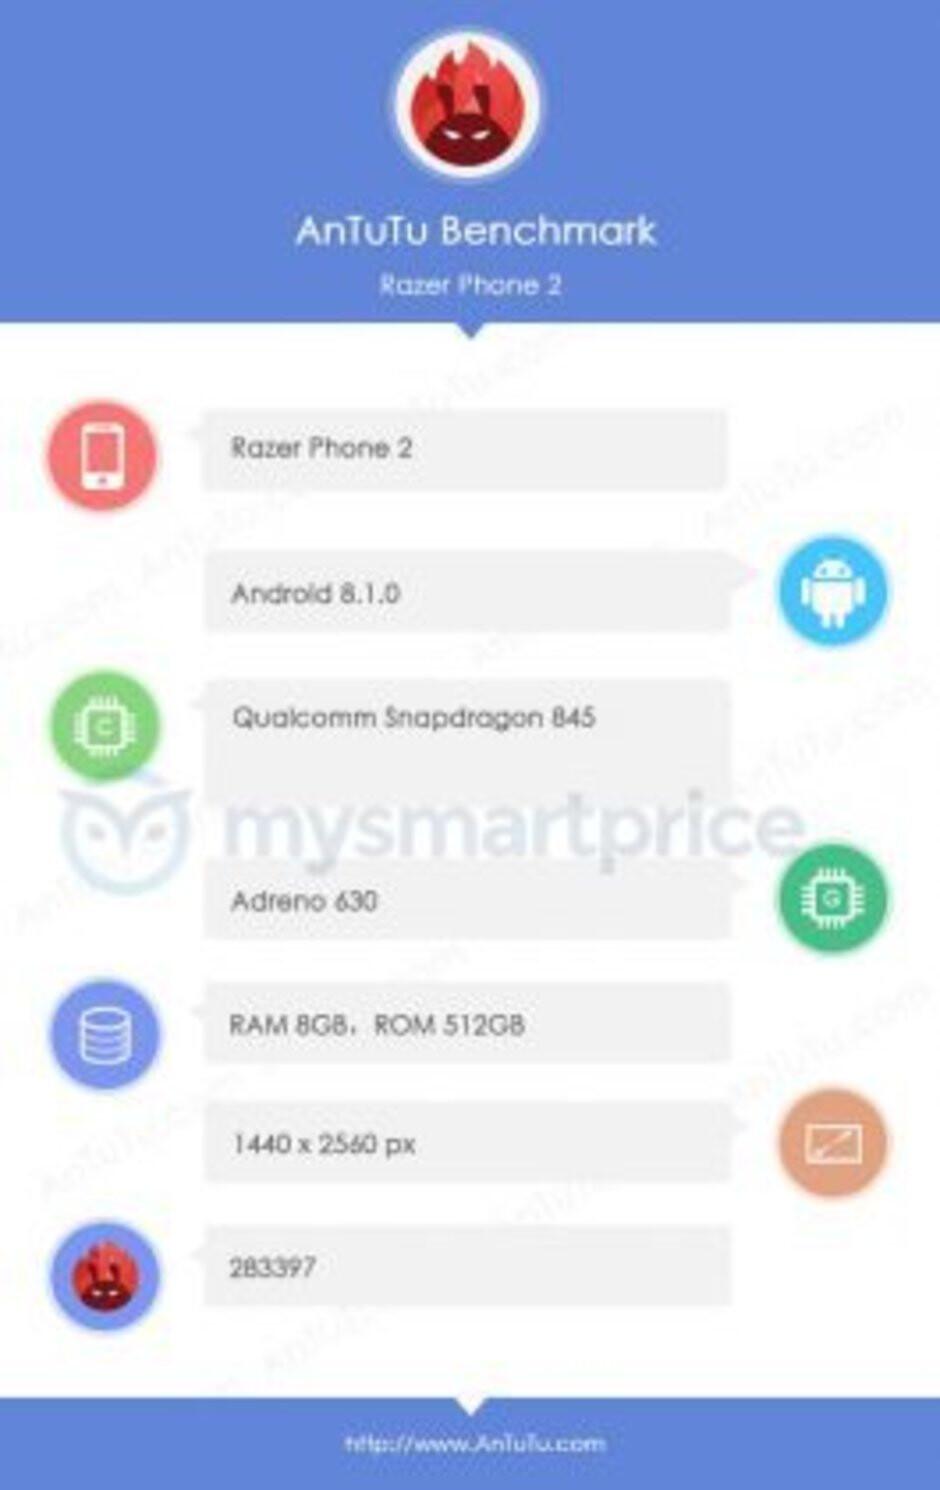 Razer Phone 2 with 512GB of storage, 16:9 display pops up on AnTuTu